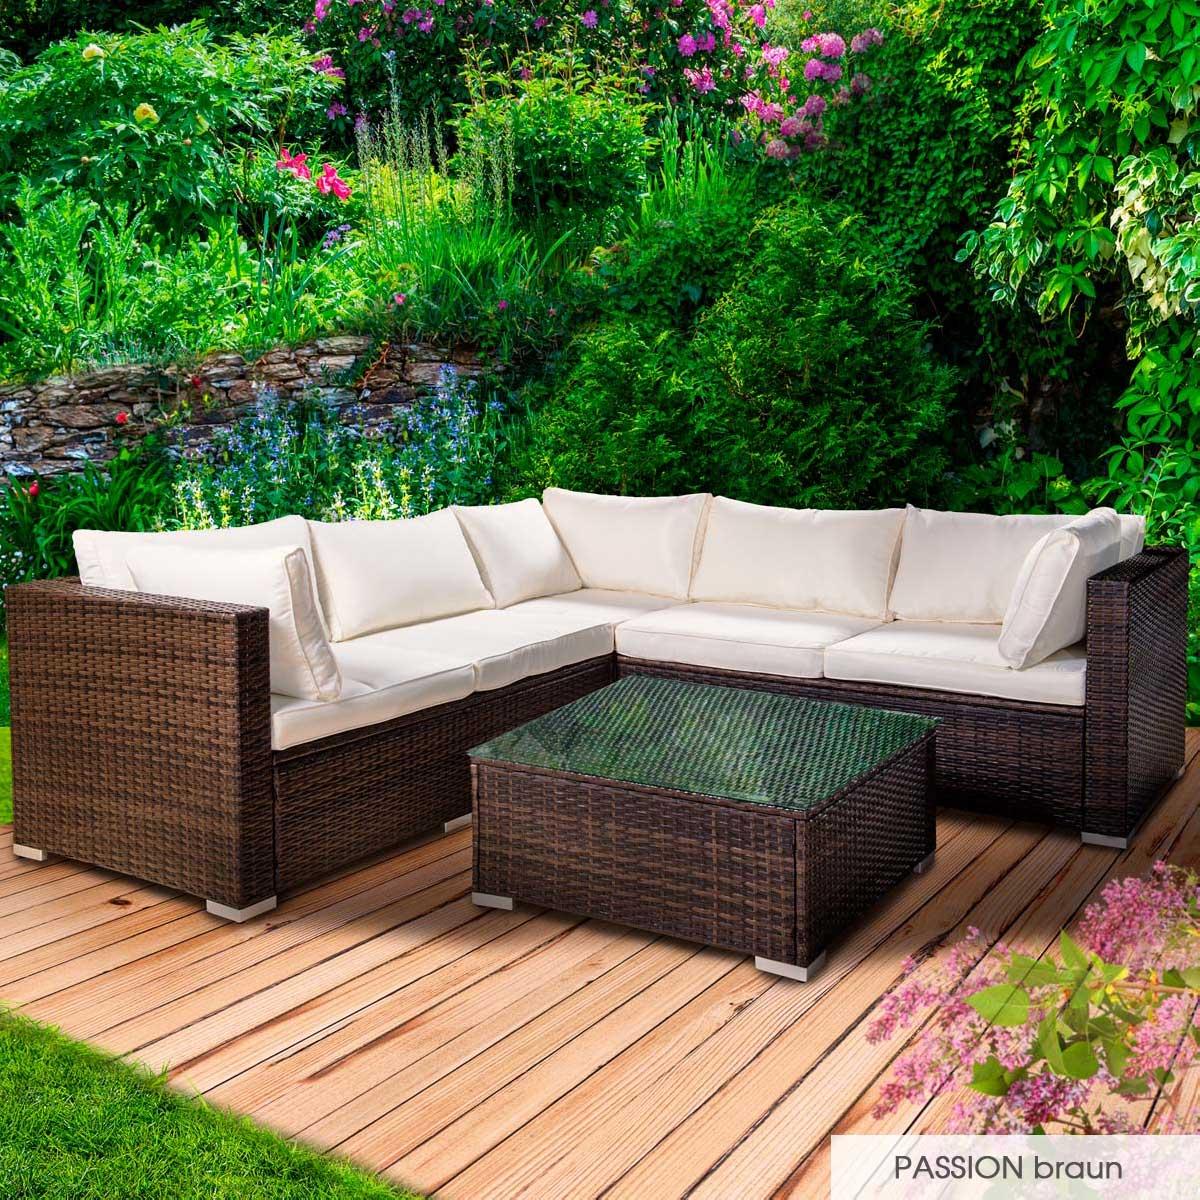 Gartenmoebel-Poly-Rattan-Lounge-Moebel-Sitzgarnitur-Gartengarnitur-Sitzgruppe-Sofa Indexbild 20